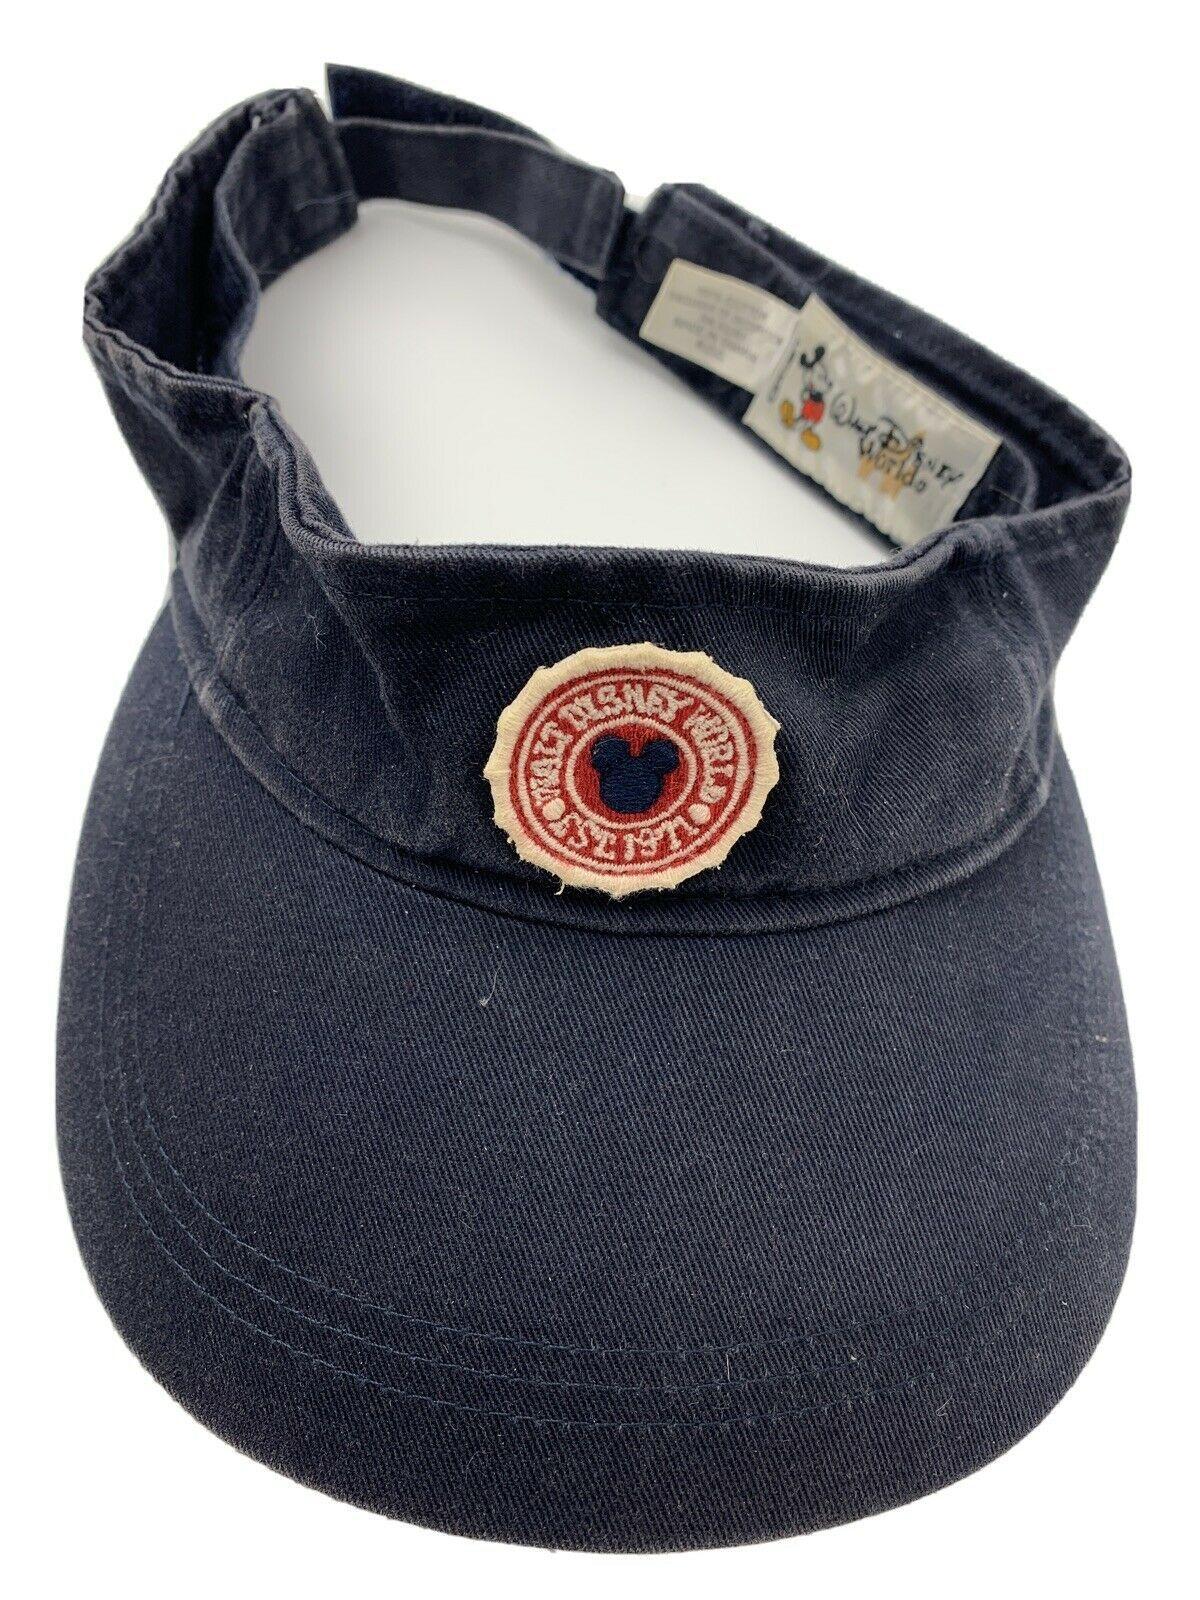 Walt Disney World Est 1971 Adjustable Adult Visor Cap Hat - $11.08